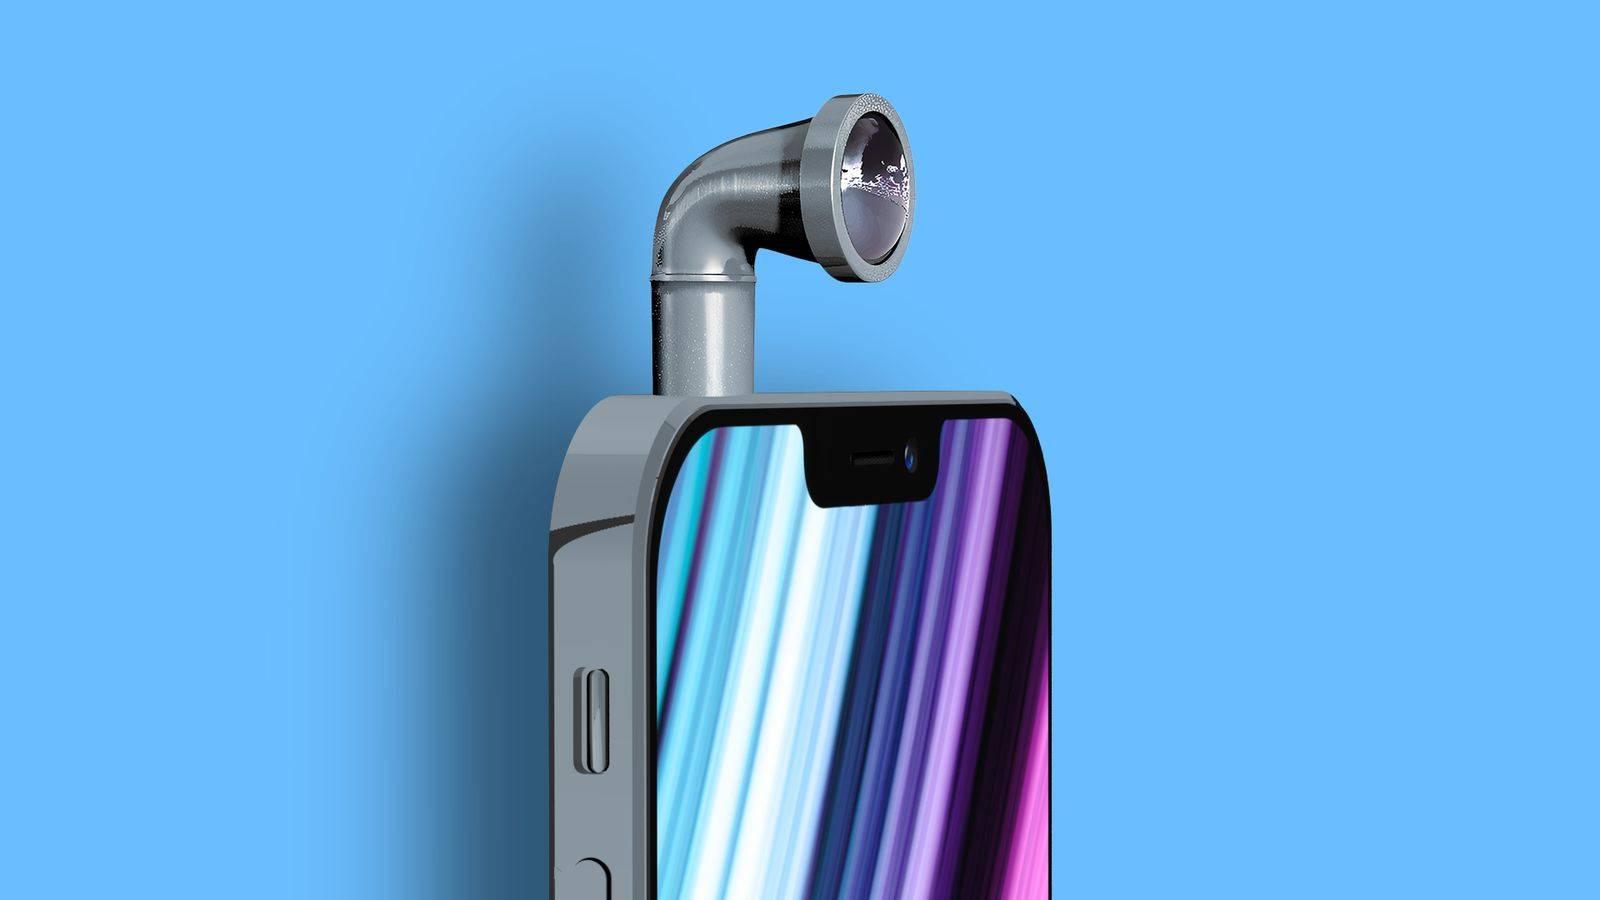 iPhone要上潜望式镜头了 但我敢说当前的长焦之战